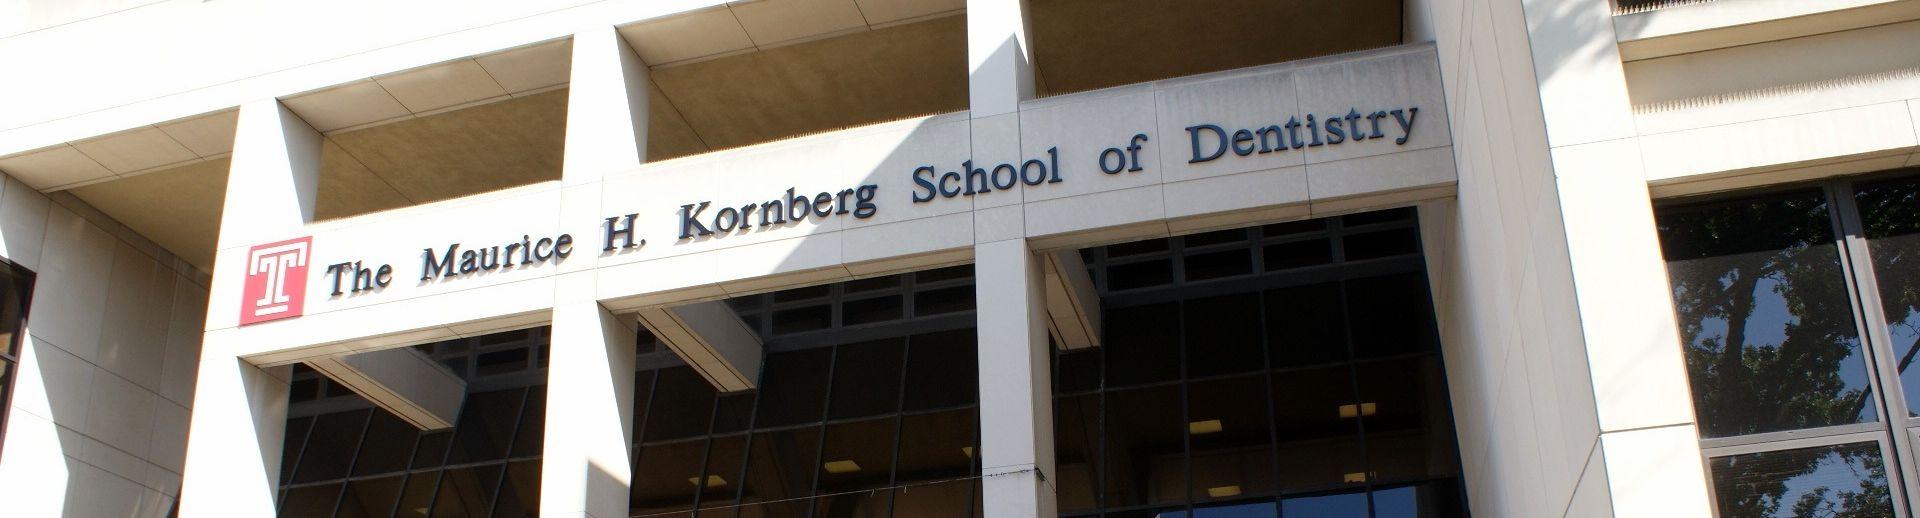 The entrance to the Kornberg School of Dentistry.